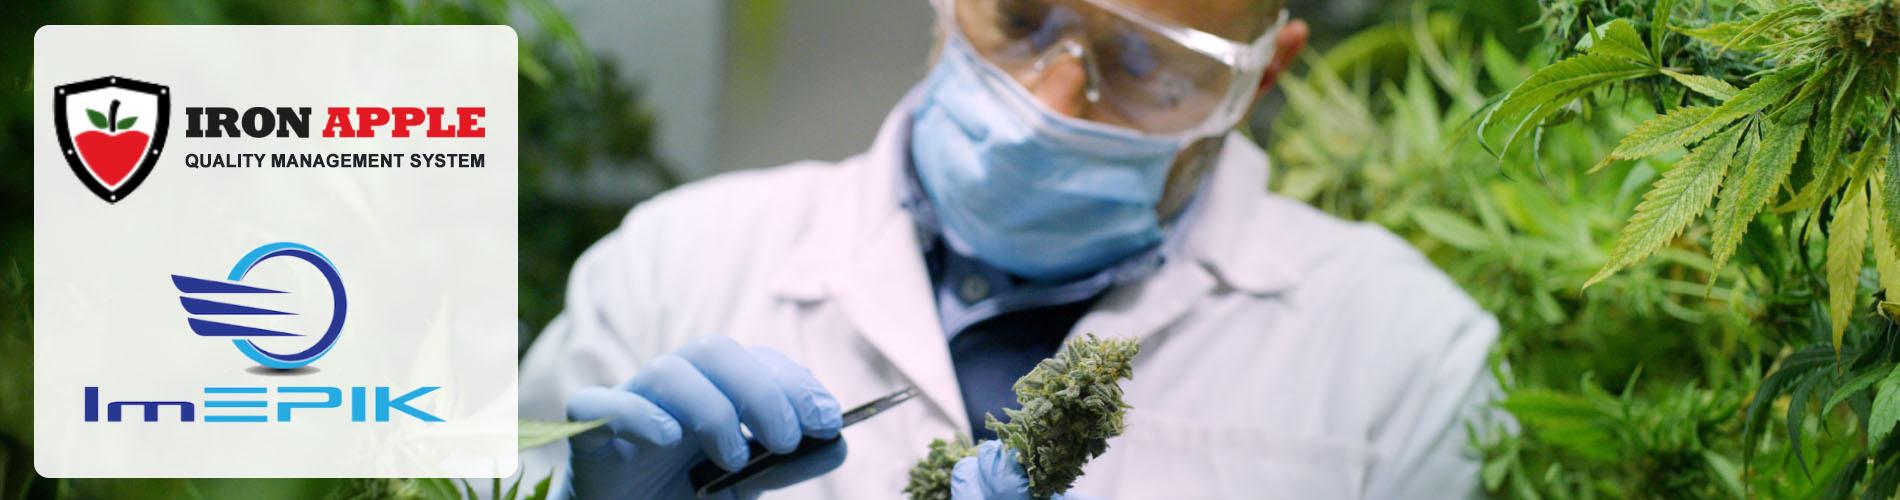 Iron Apple QMS for Cannabis Production ImEpik Food Safety Training